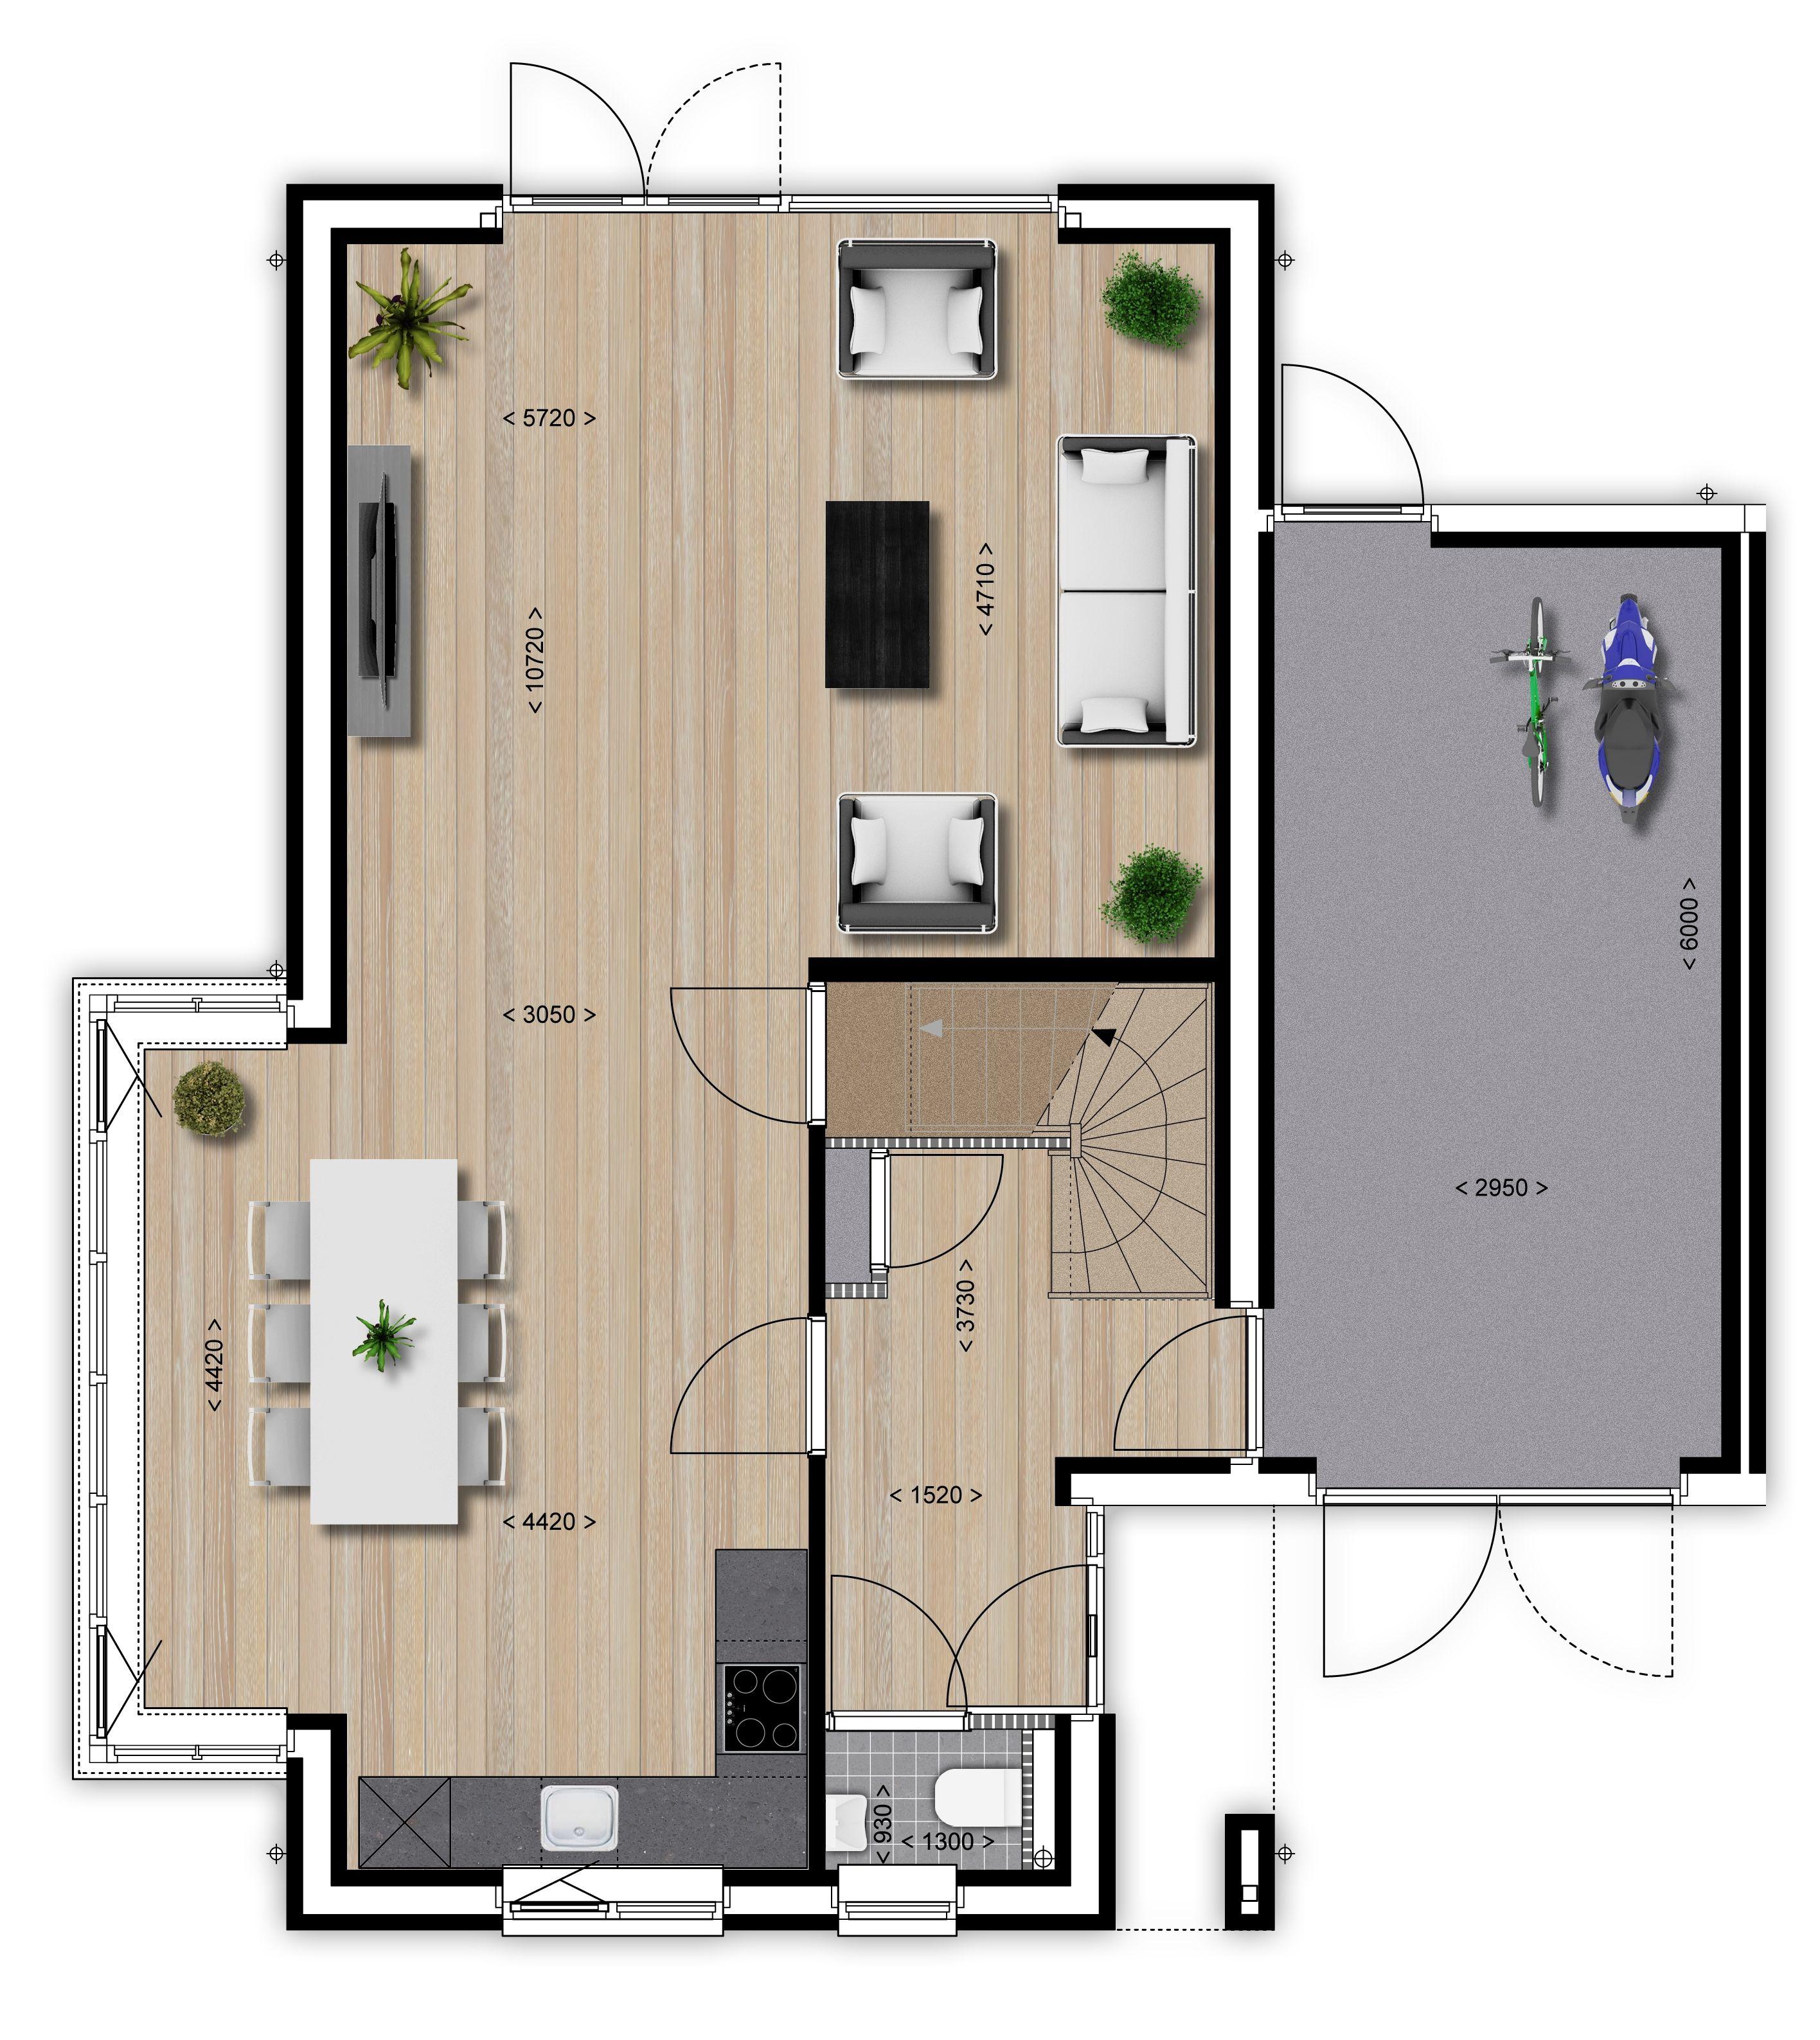 Plattegrond vrijstaande woning google zoeken for Woning indeling